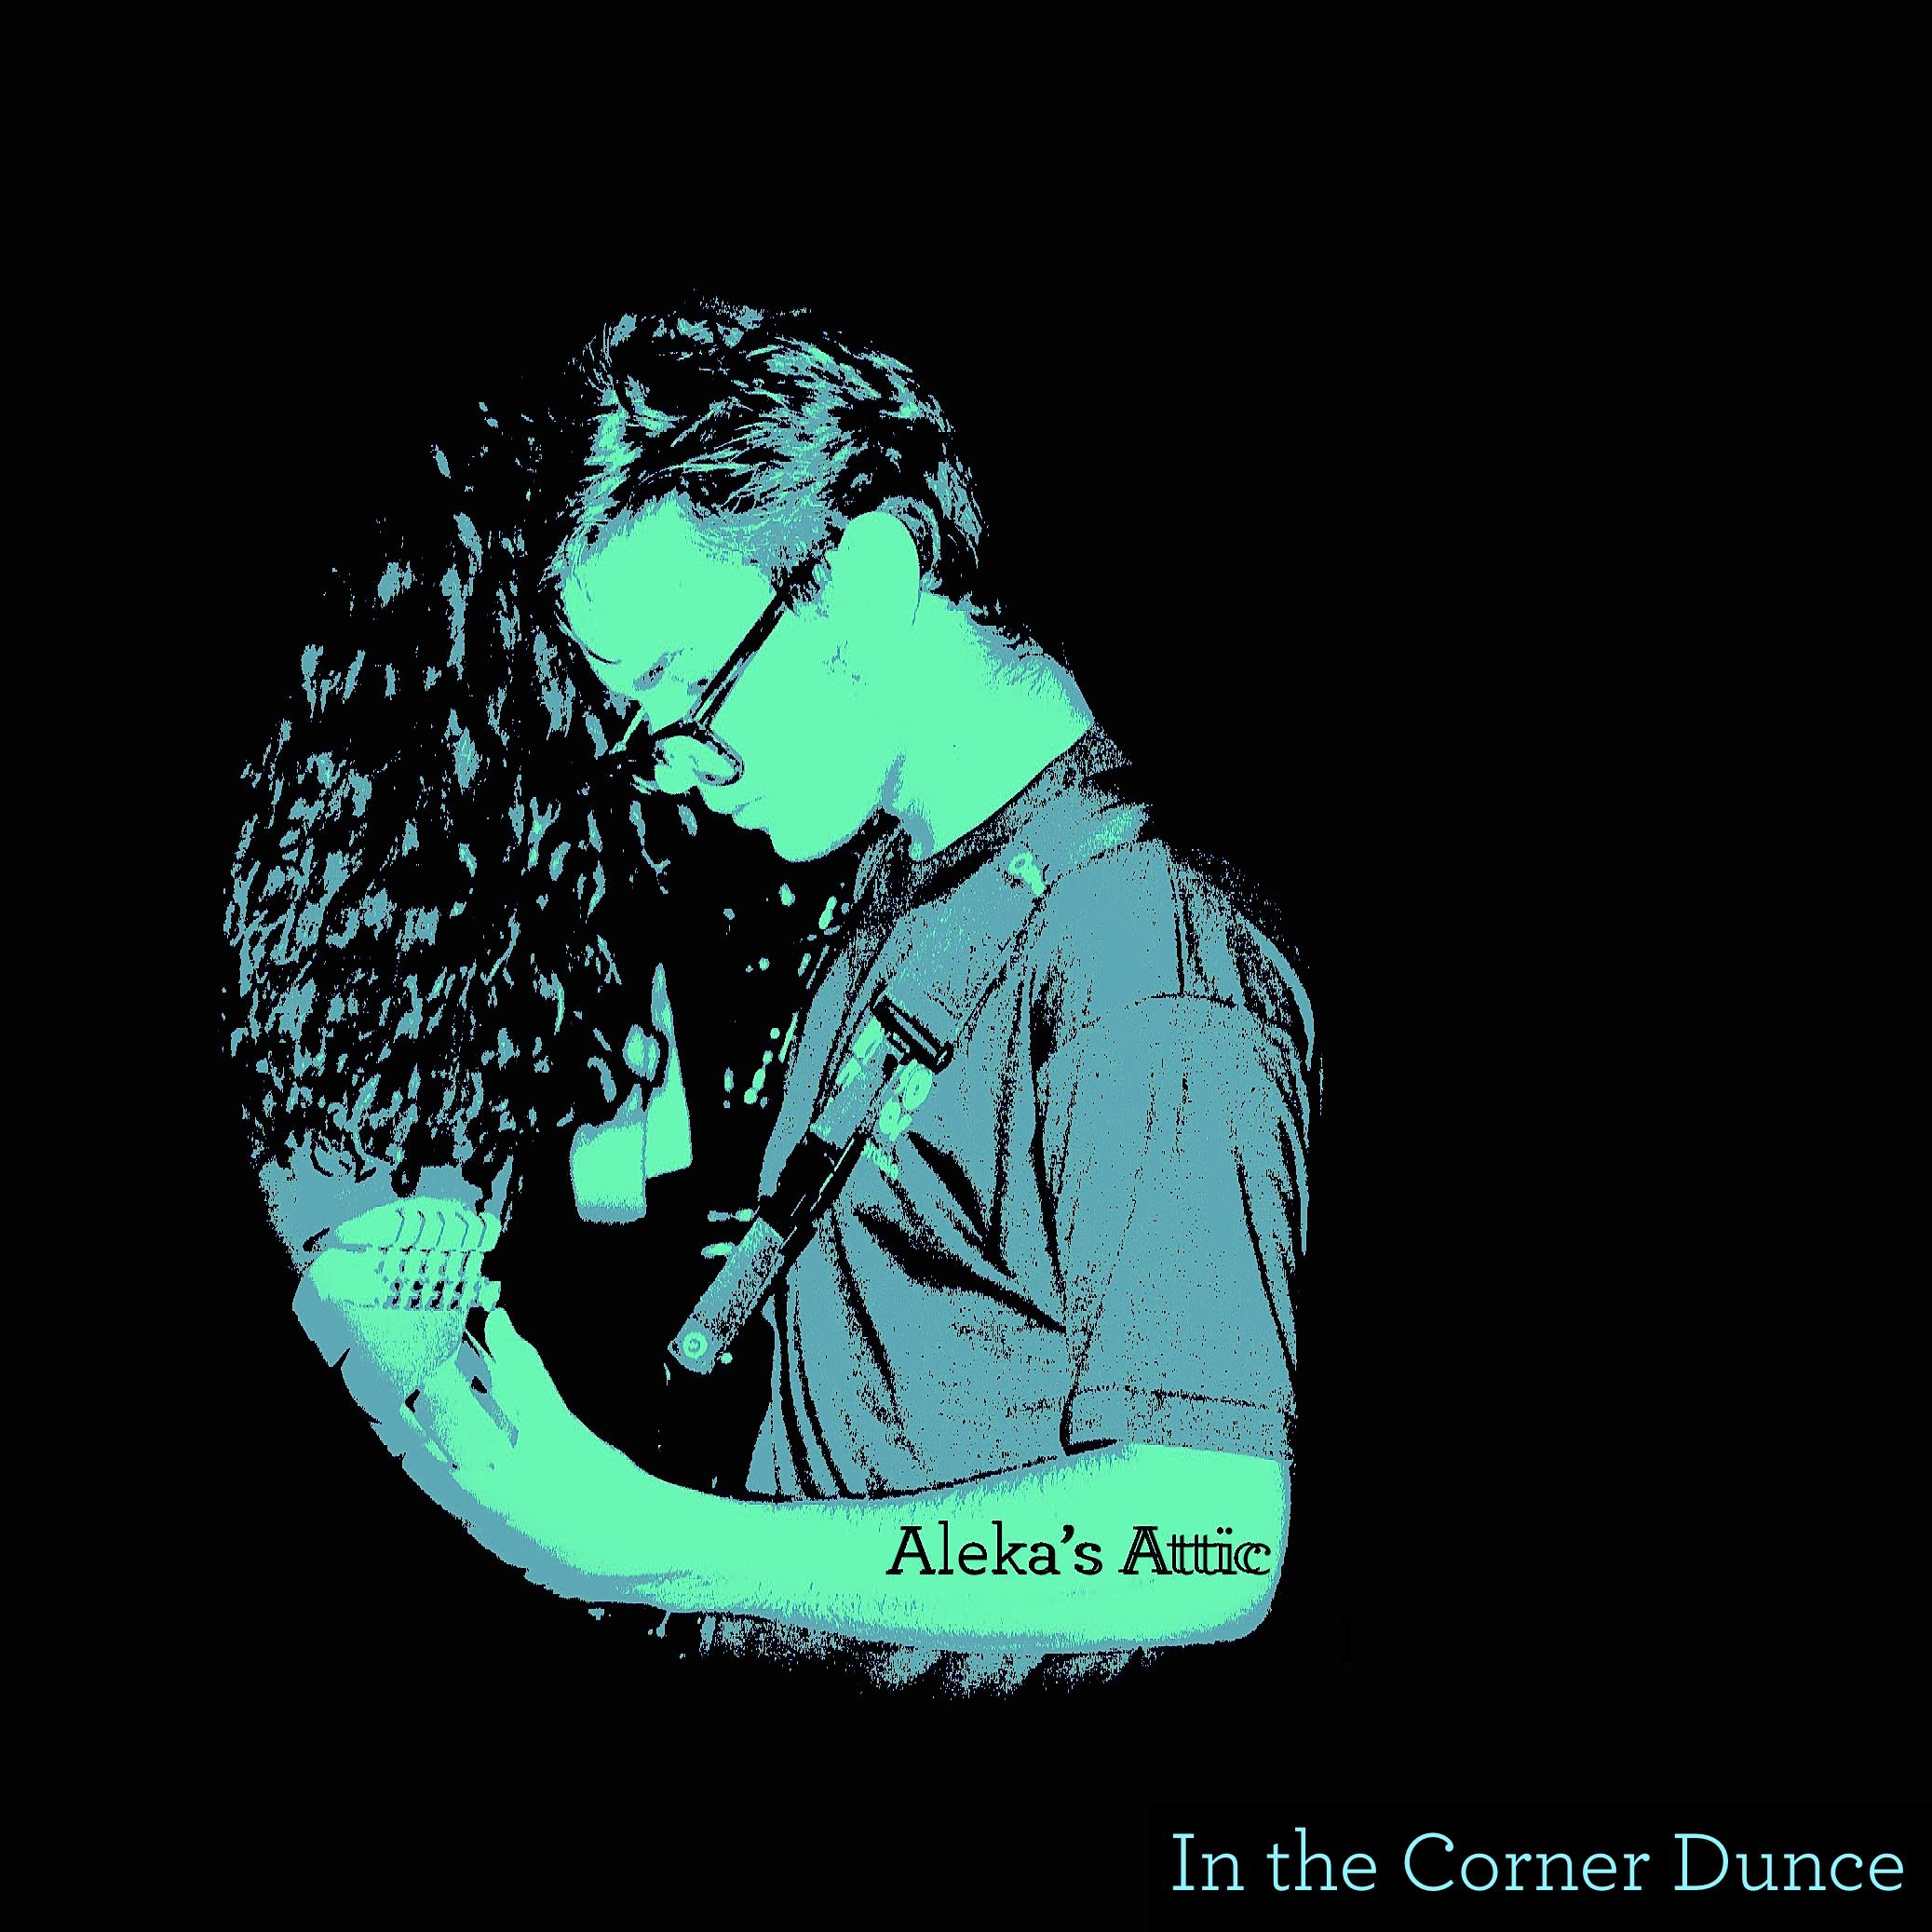 Aleka's Attic copy.jpg